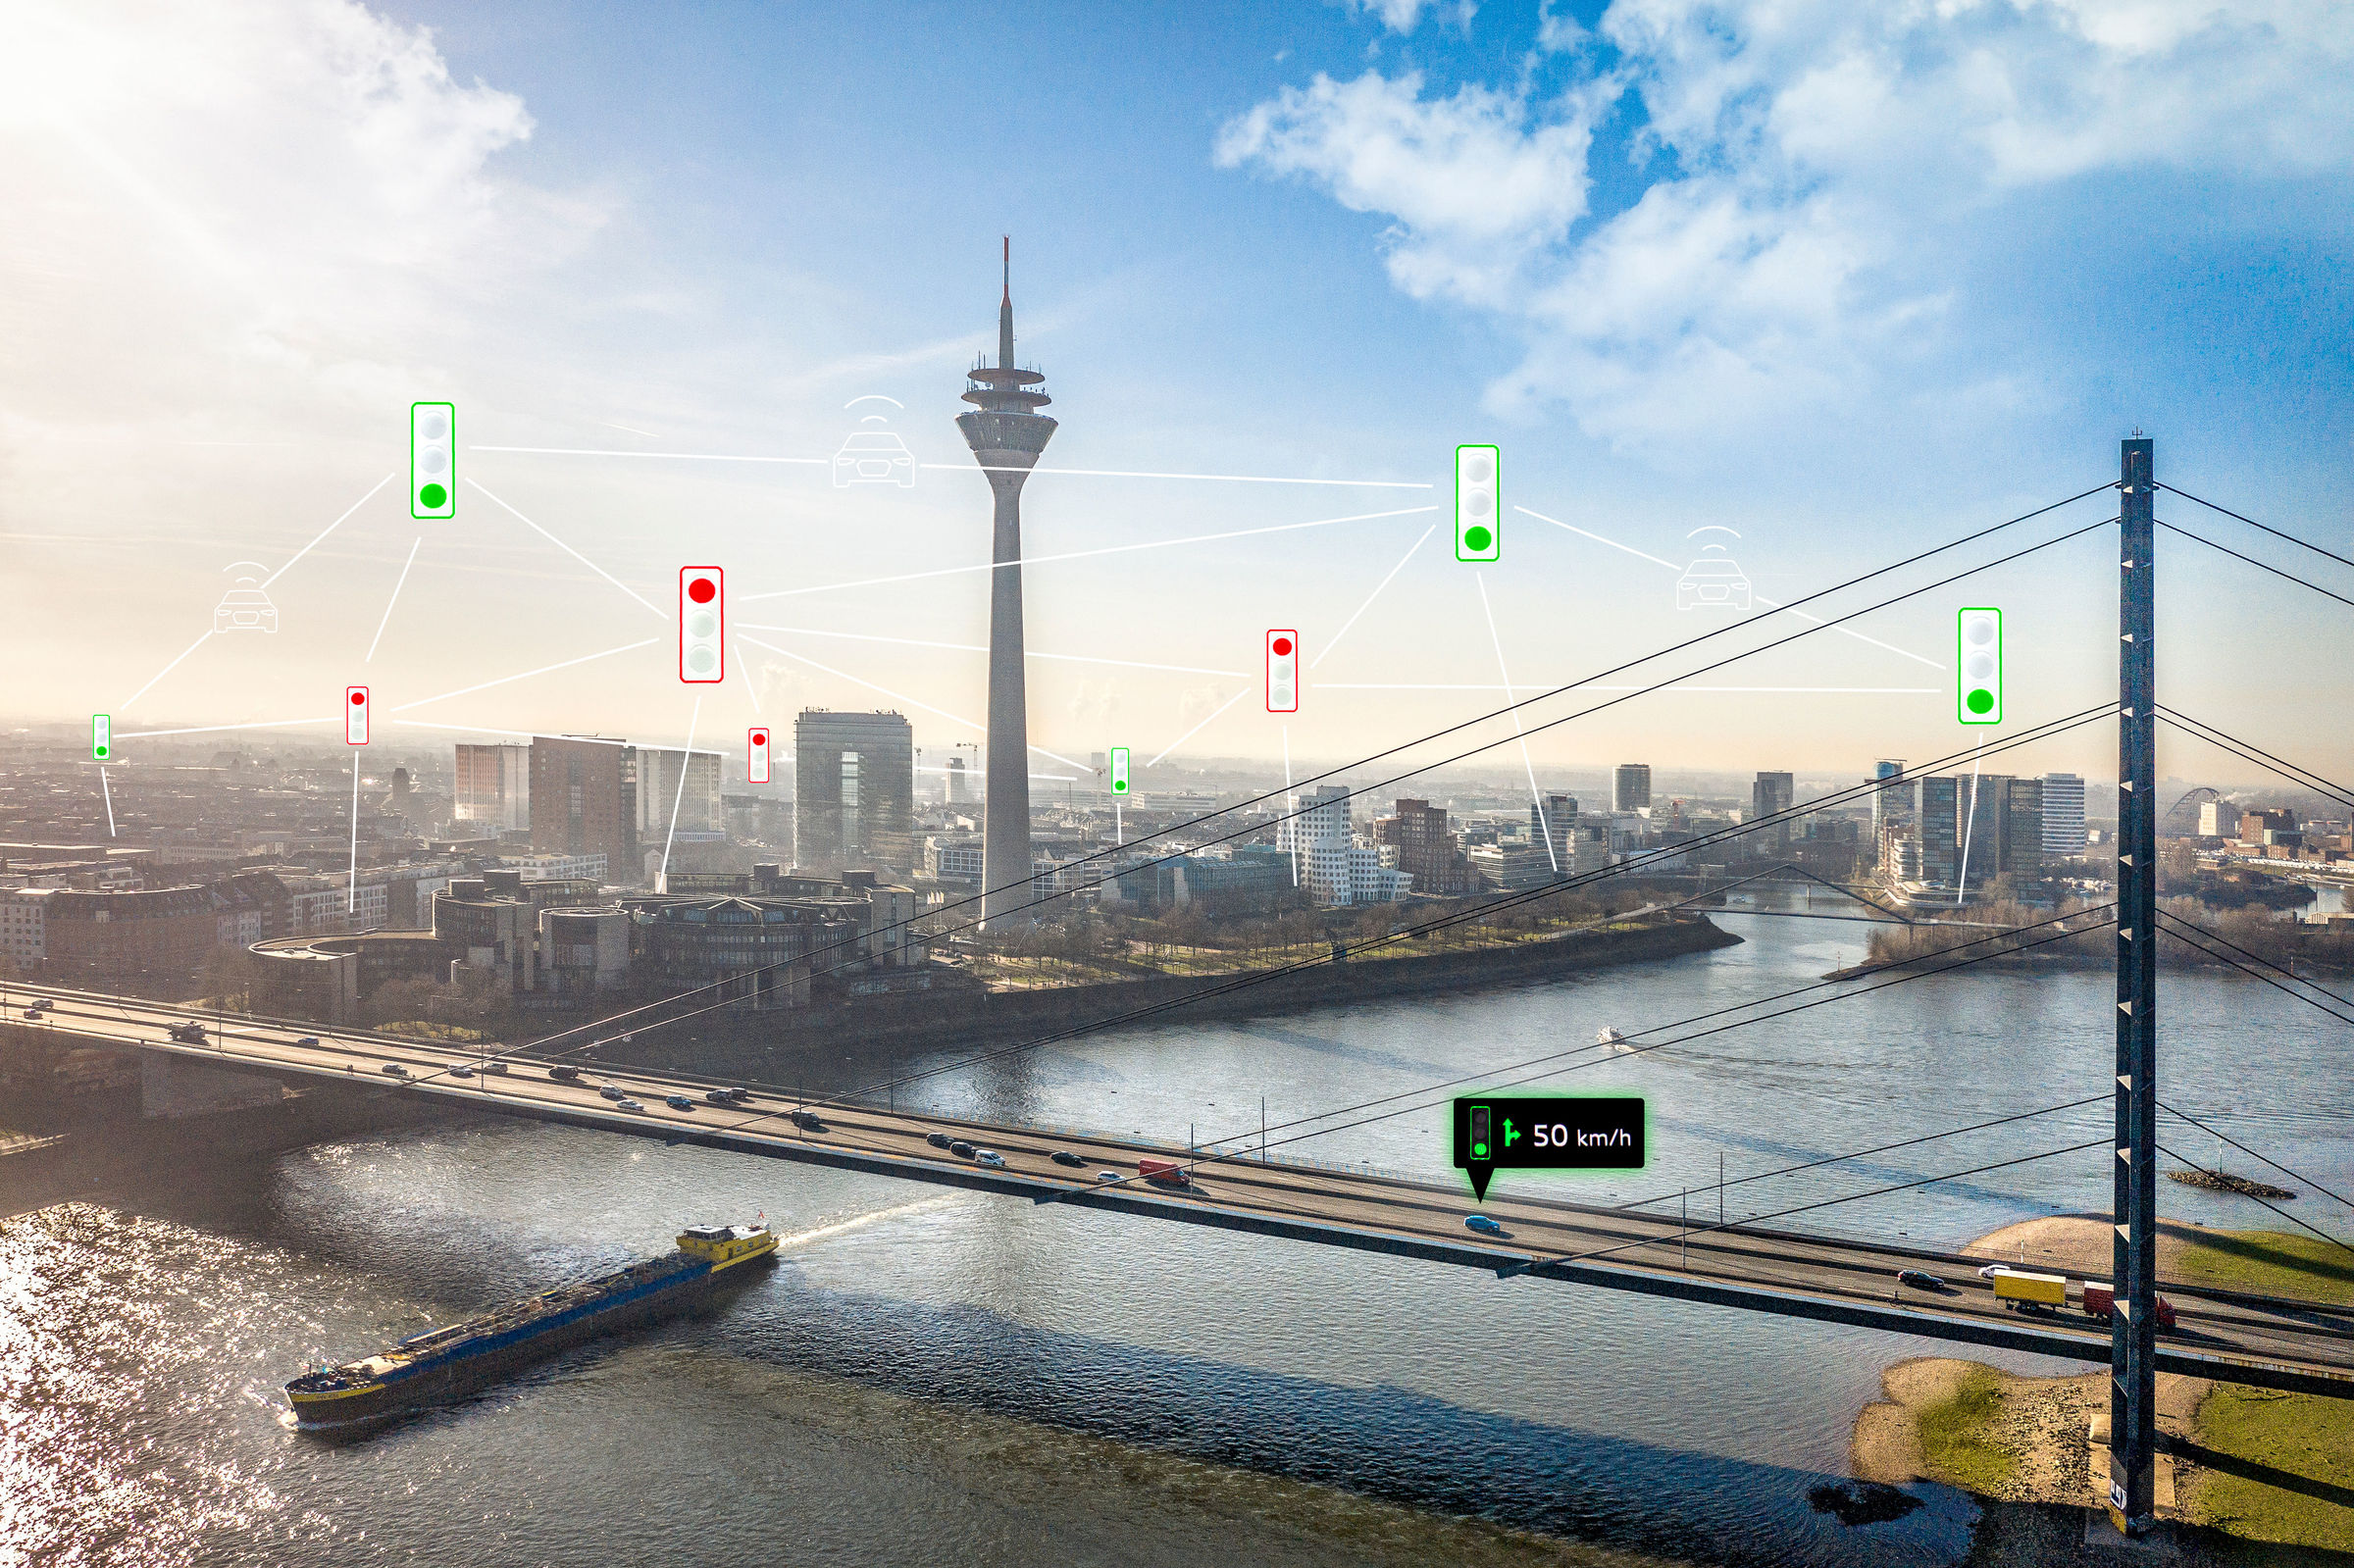 Audi networks with traffic lights in Düsseldorf - Image 4